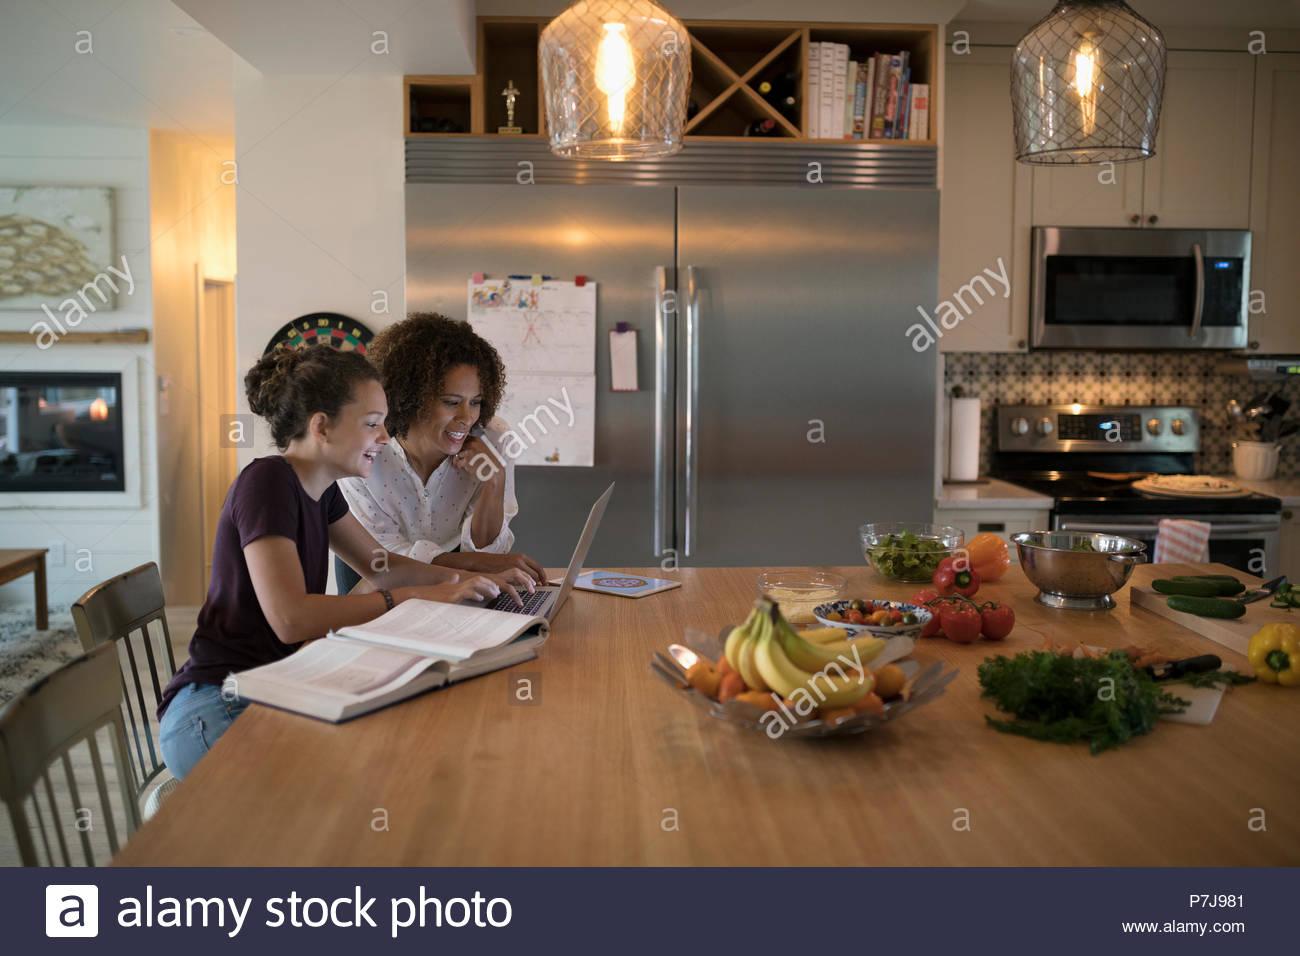 Mother helping tween daughter doing homework at laptop in kitchen - Stock Image